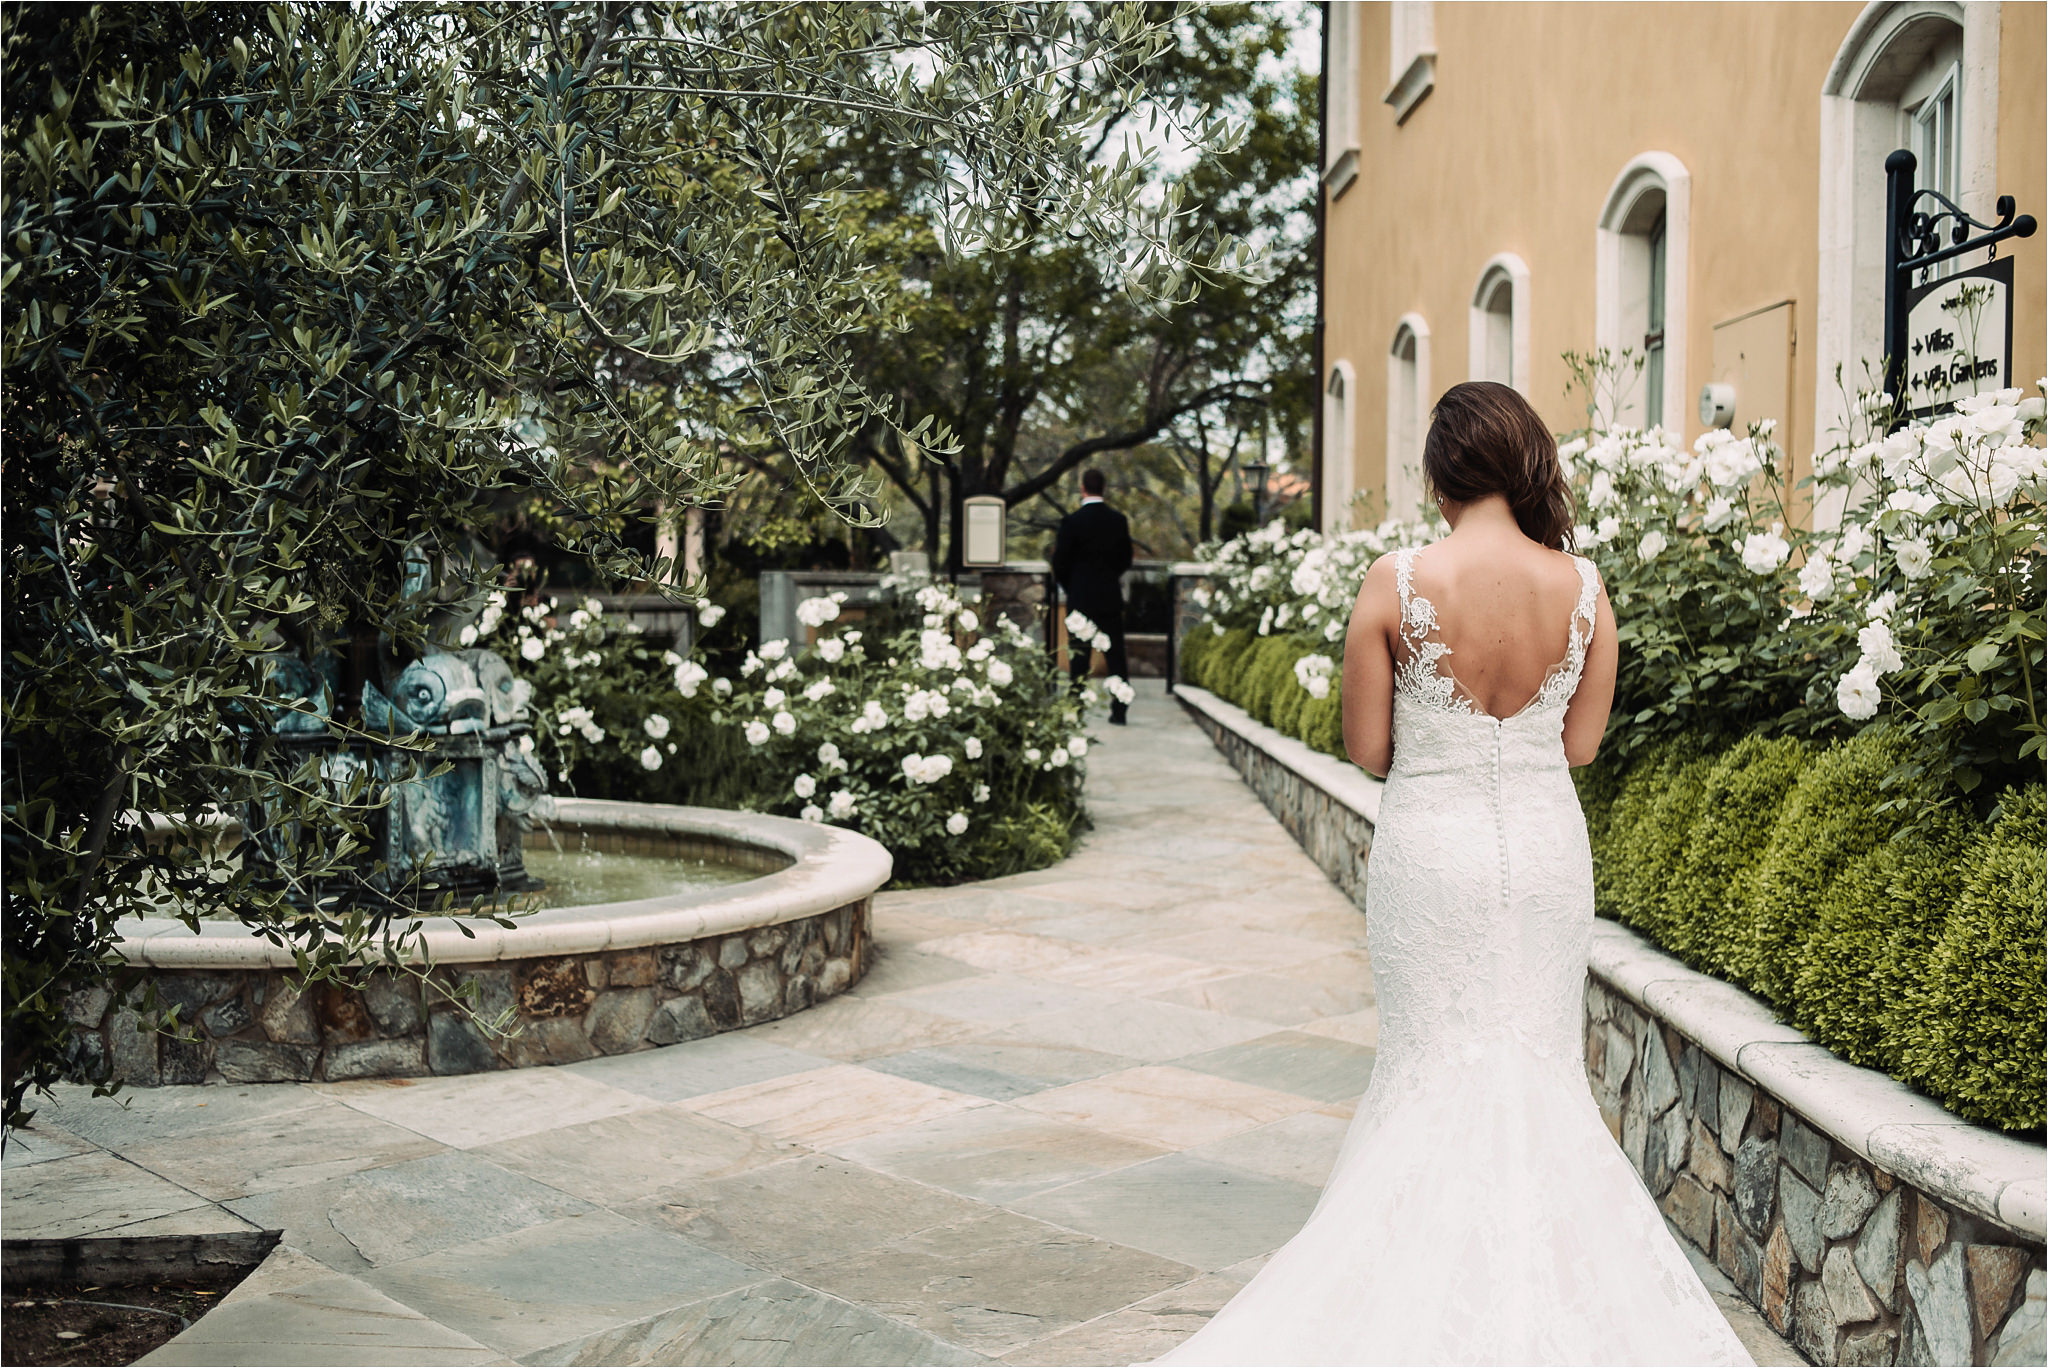 jessica-roman-photography-arden hills wedding photograpger-sacramento-boise-10.jpg